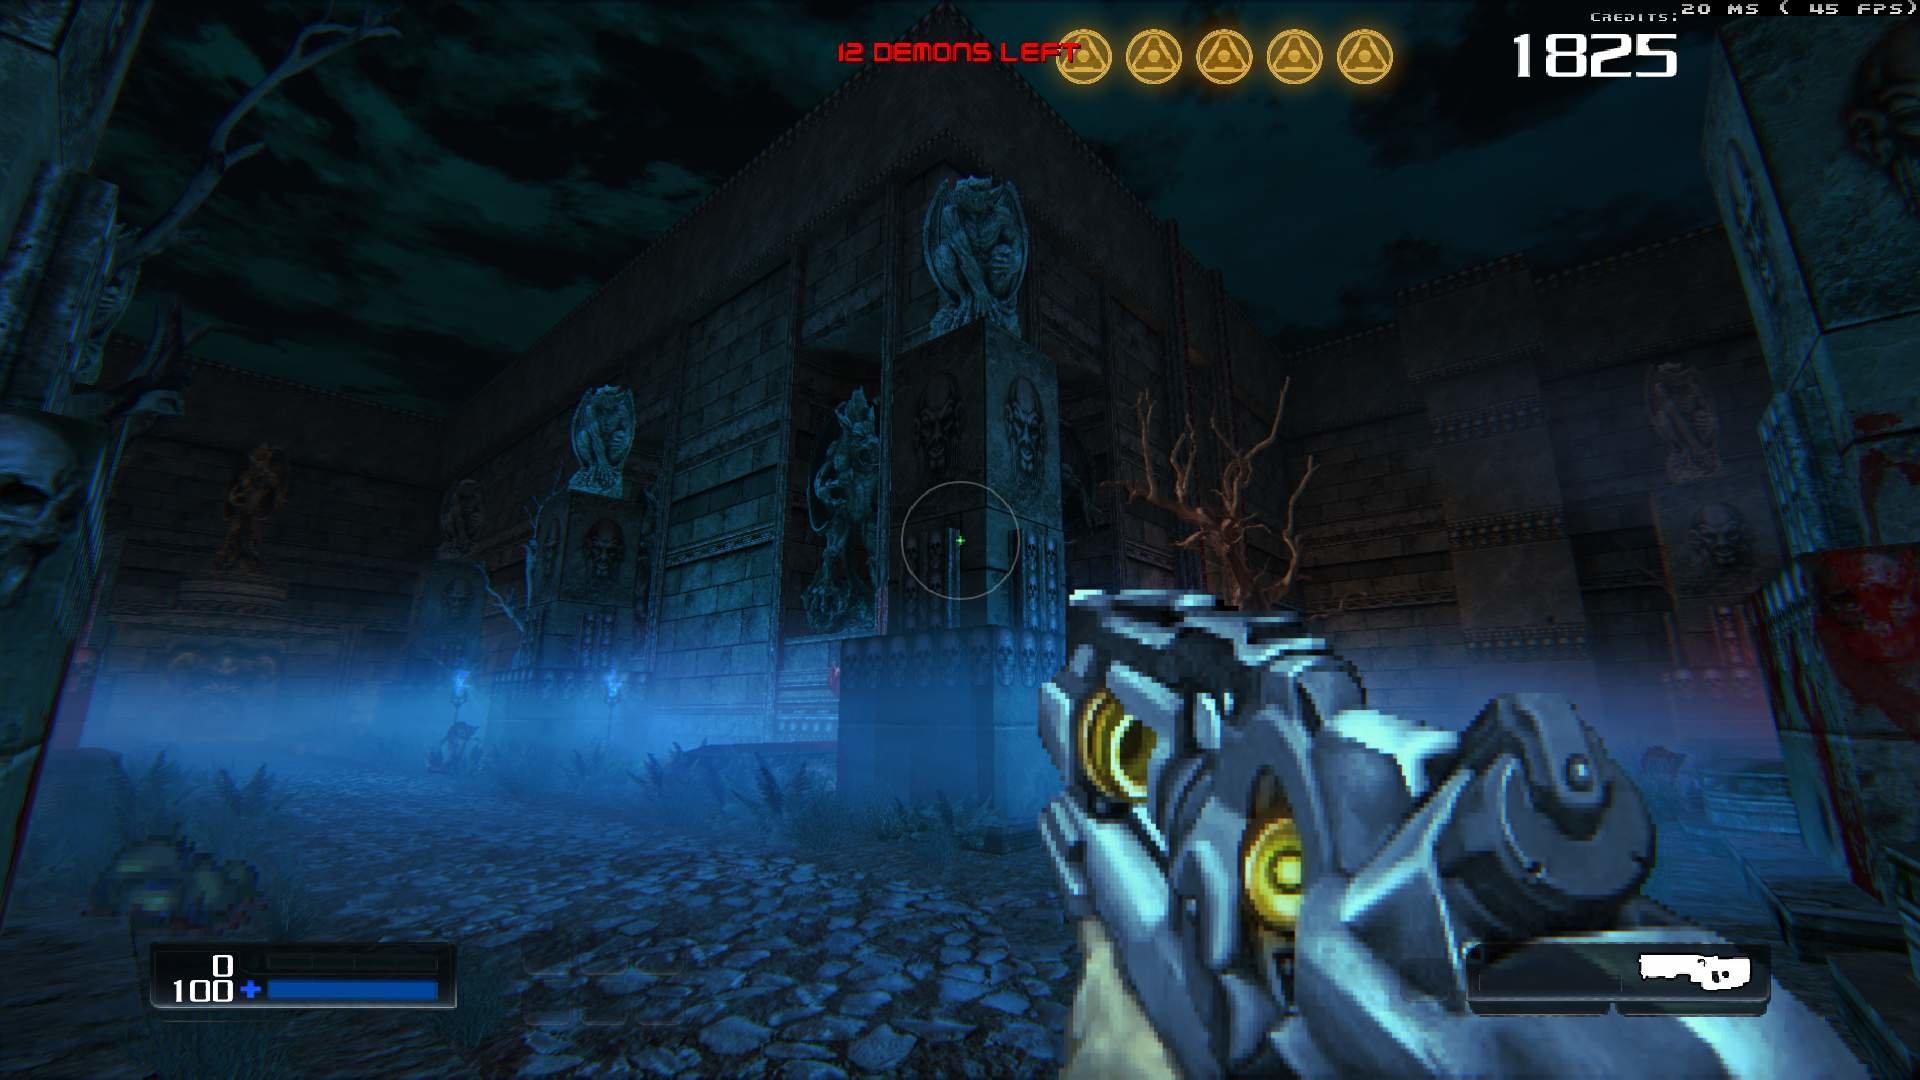 Screenshot_Doom_20180905_225642.jpg.c23142f7f9f4e01c422db4d24fa0ba75.jpg